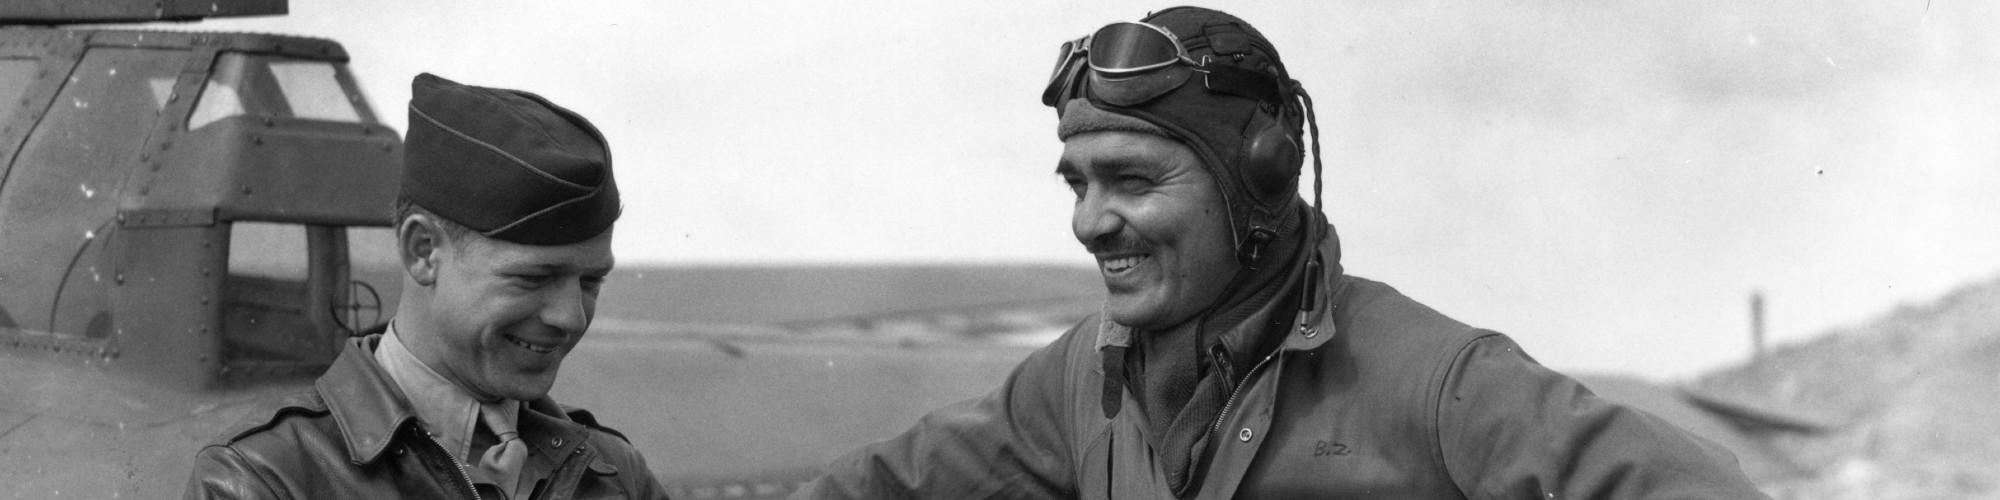 Clark Gable WW2 Hero Banner